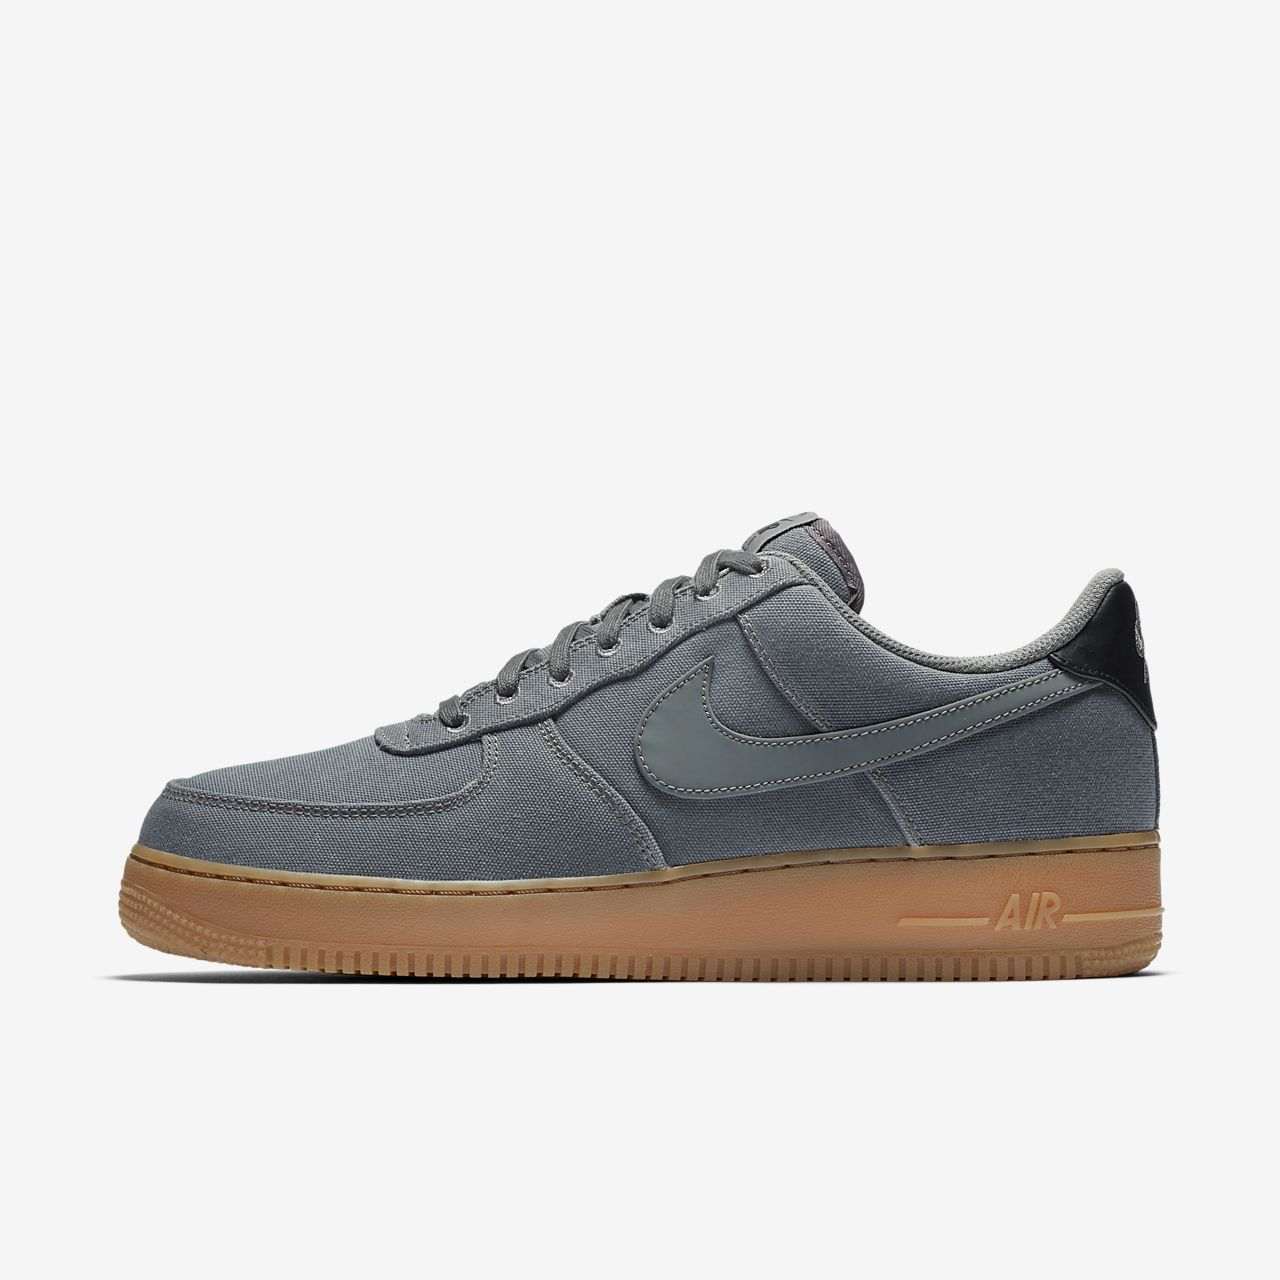 98d249f3 ... sale nike air force 1 07 lv8 style sko til mænd a1071 b62fd